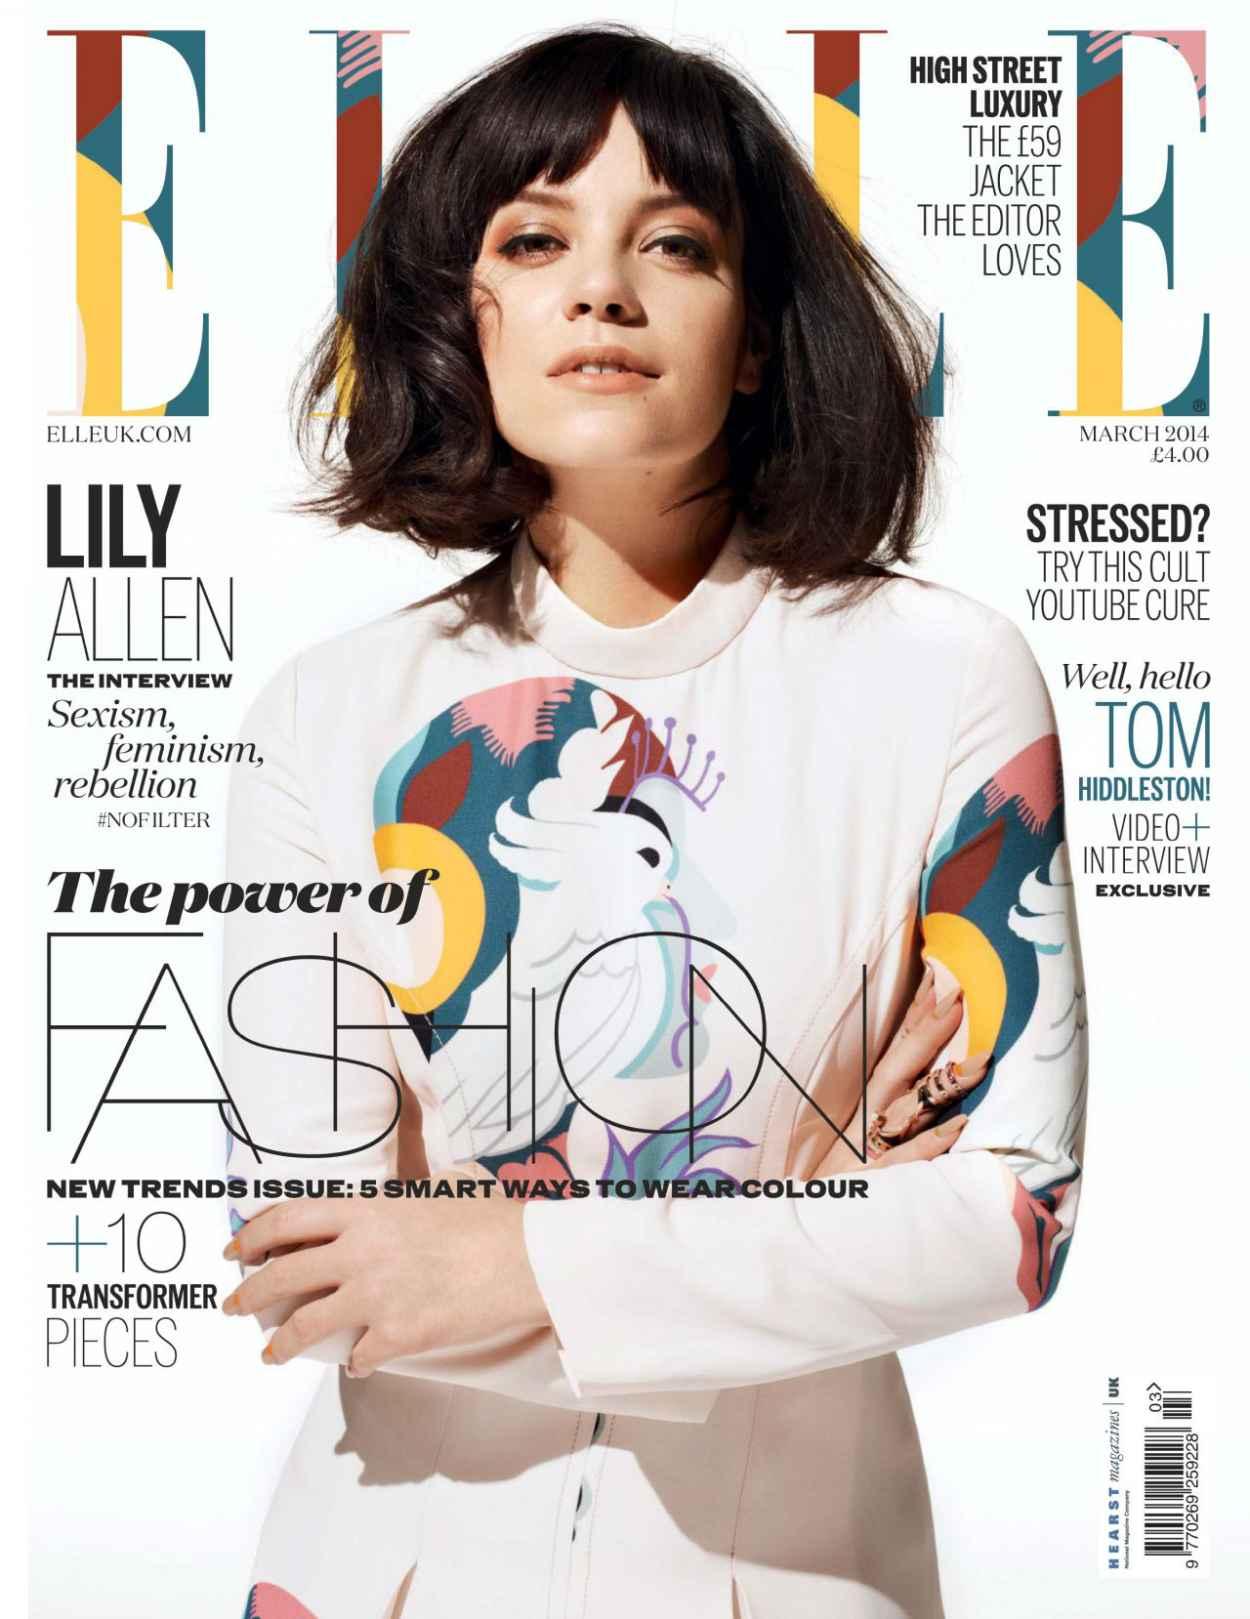 Lily Allen - ELLE Magazine (UK) - March 2015 Cover-1